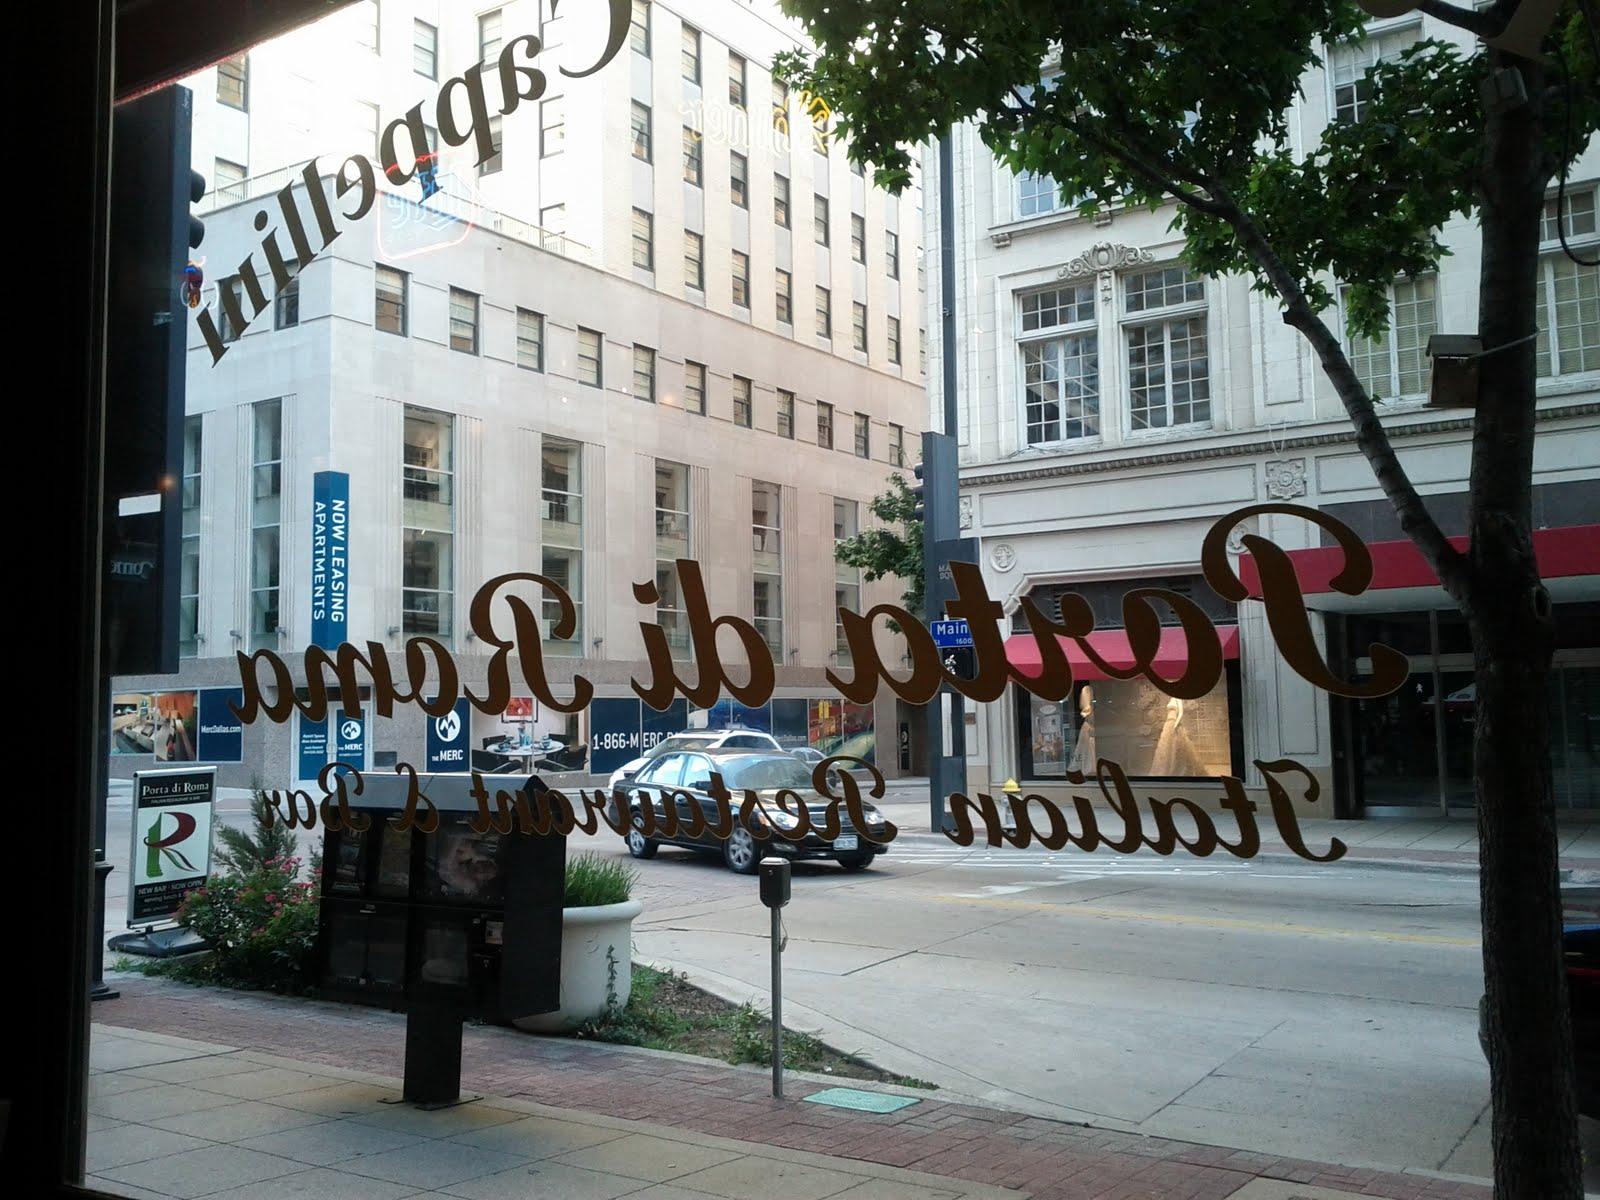 Dallas Fort Worth vacation - IMG_20110611_191215.jpg